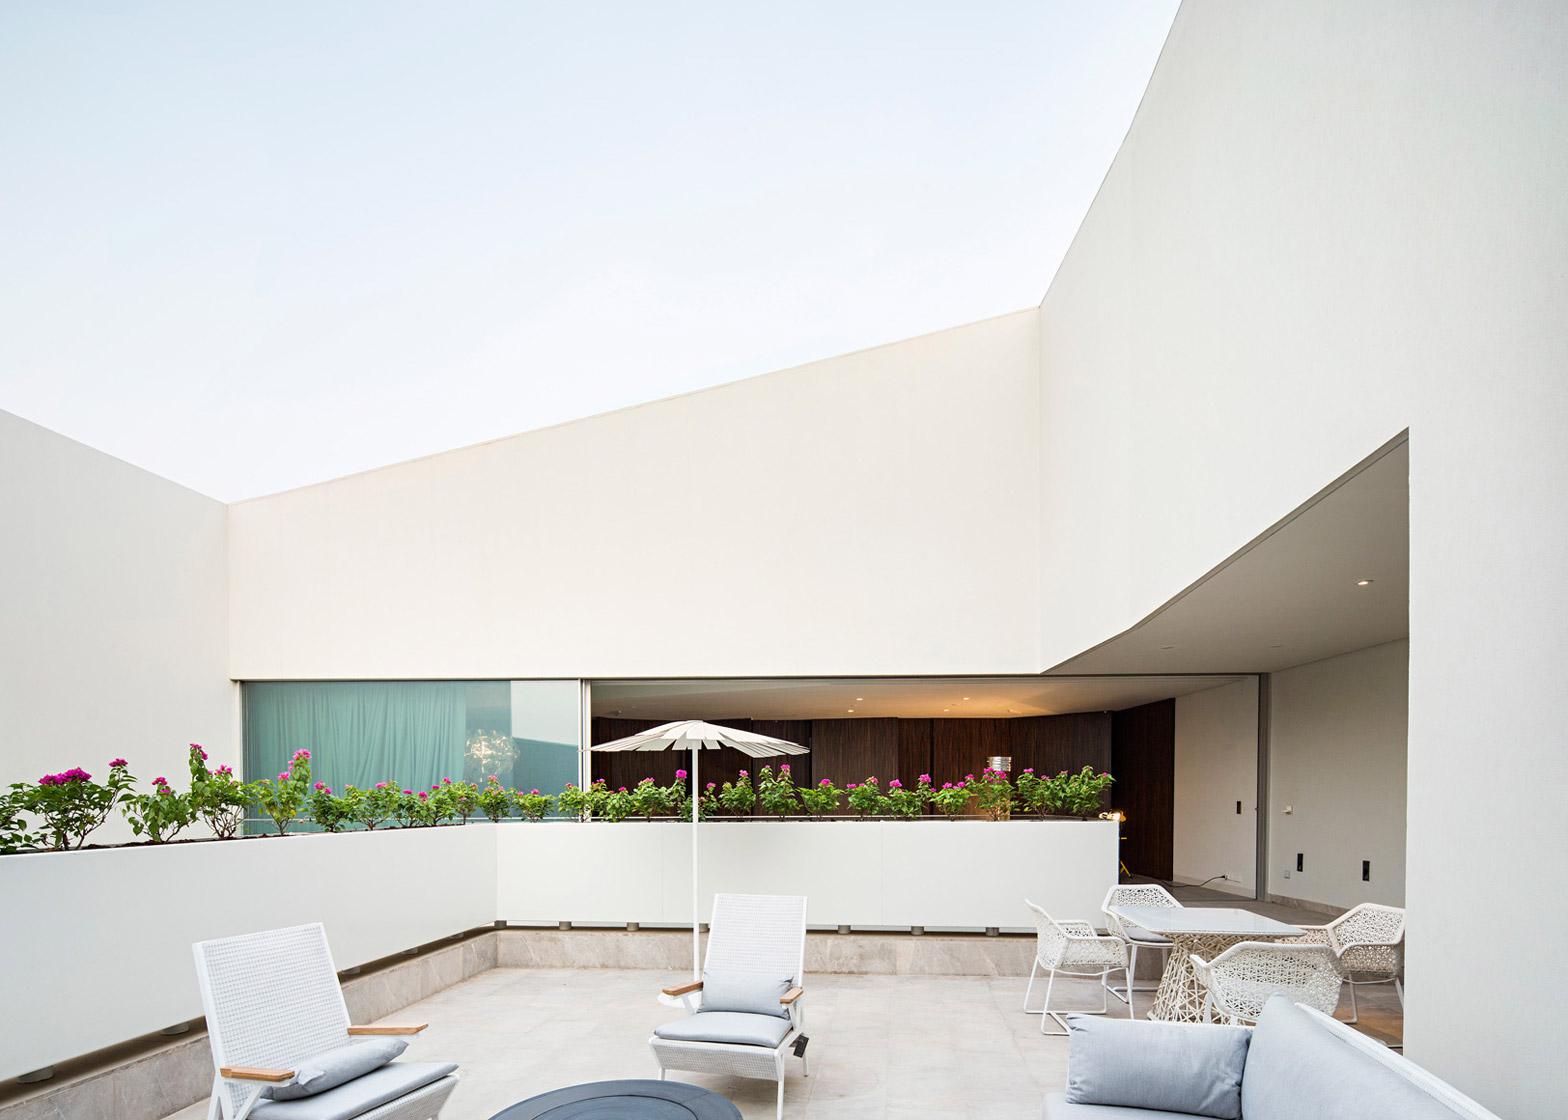 Wall House by AGi Architects